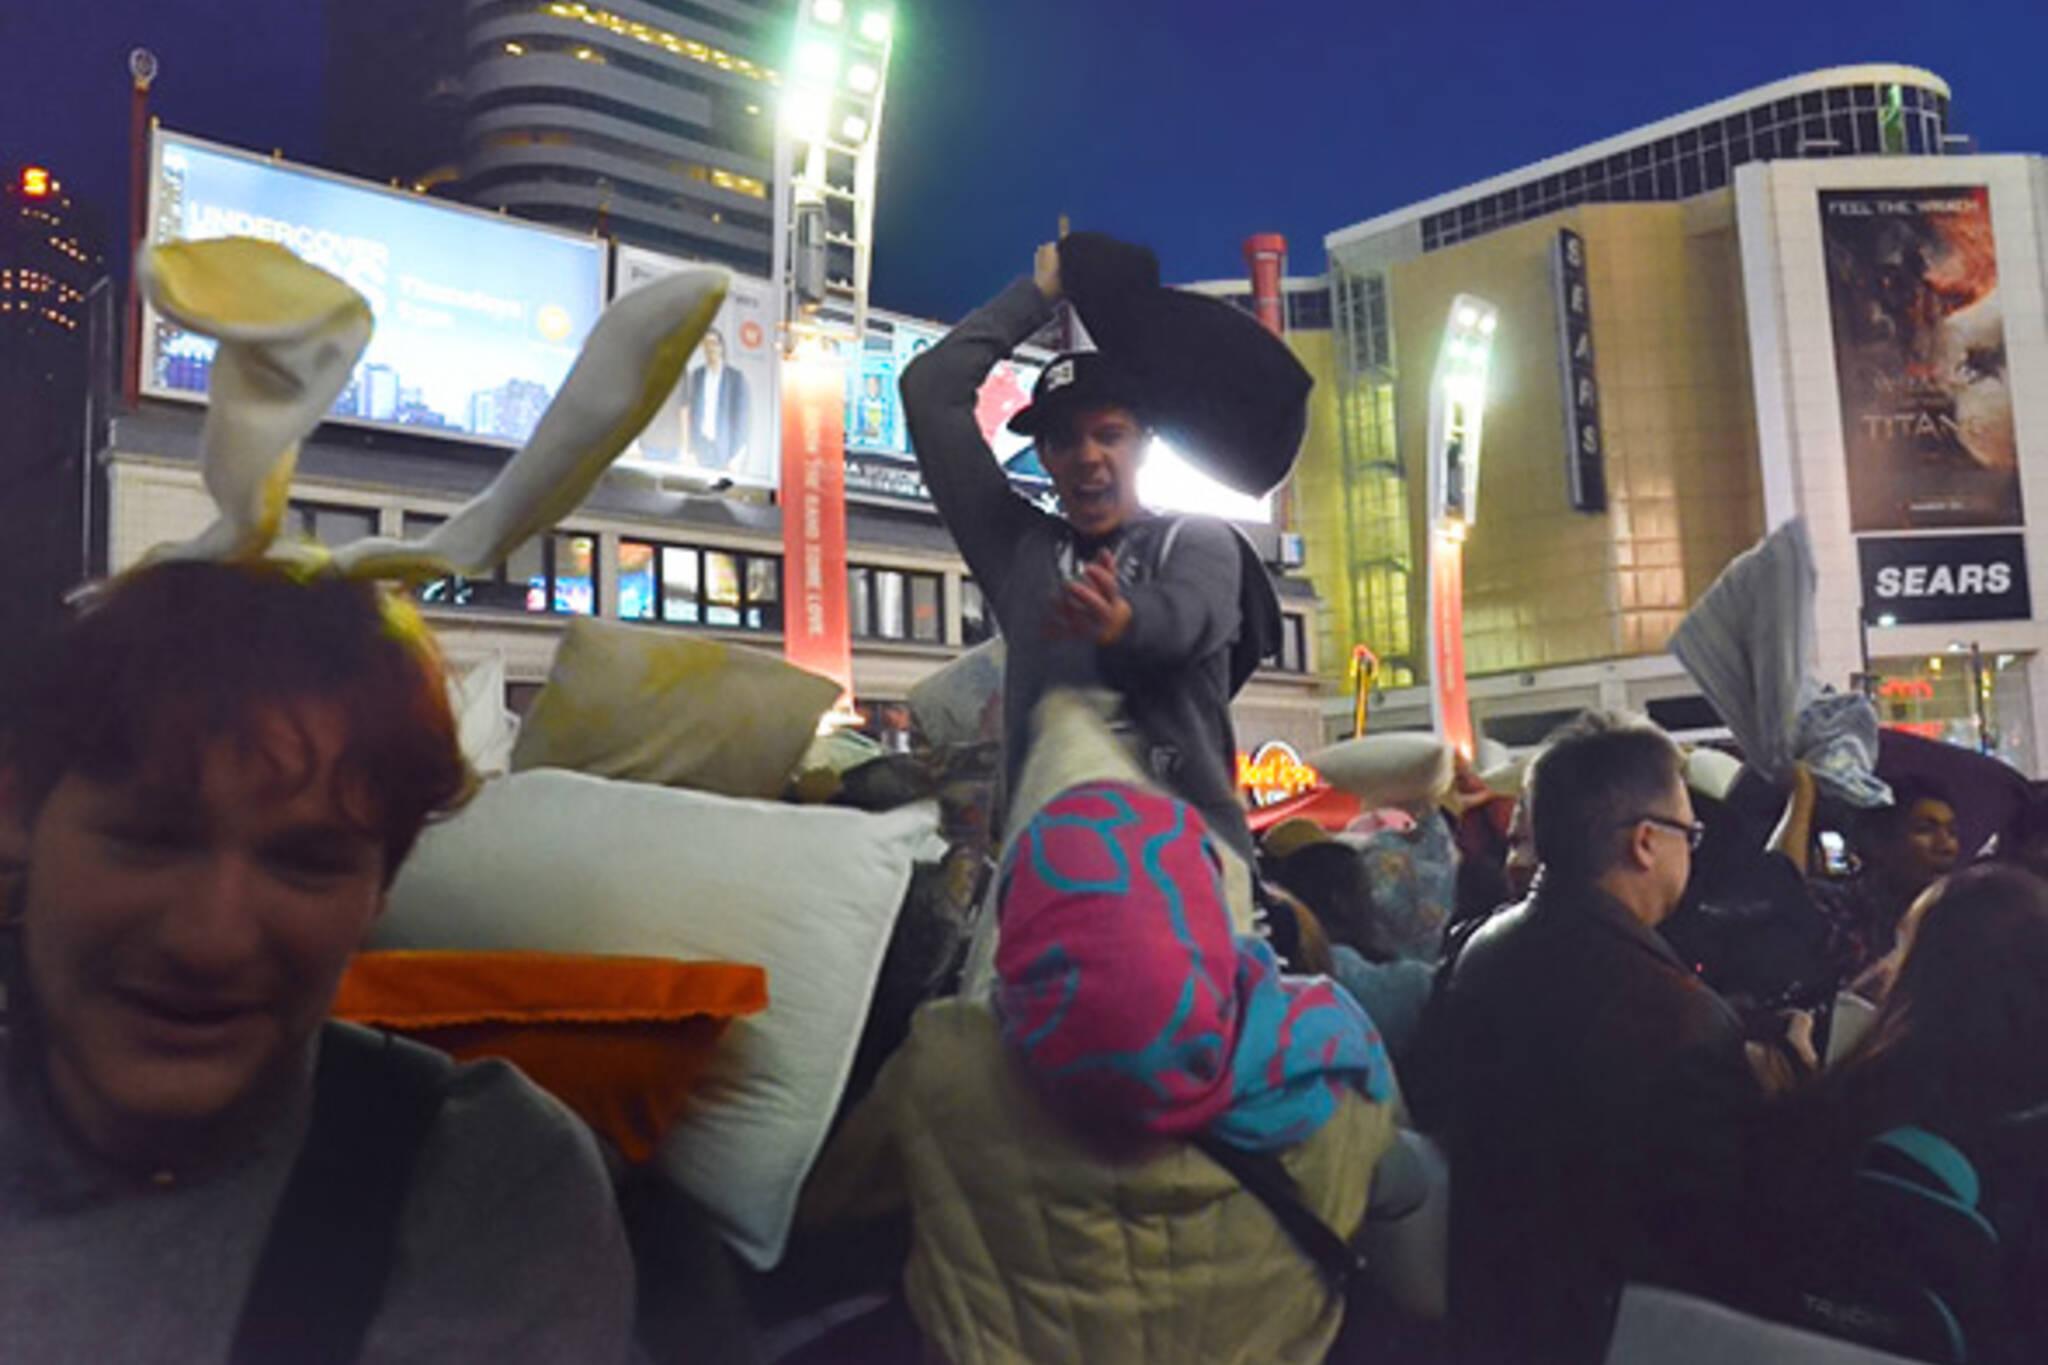 Toronto Pillow Fight 2012